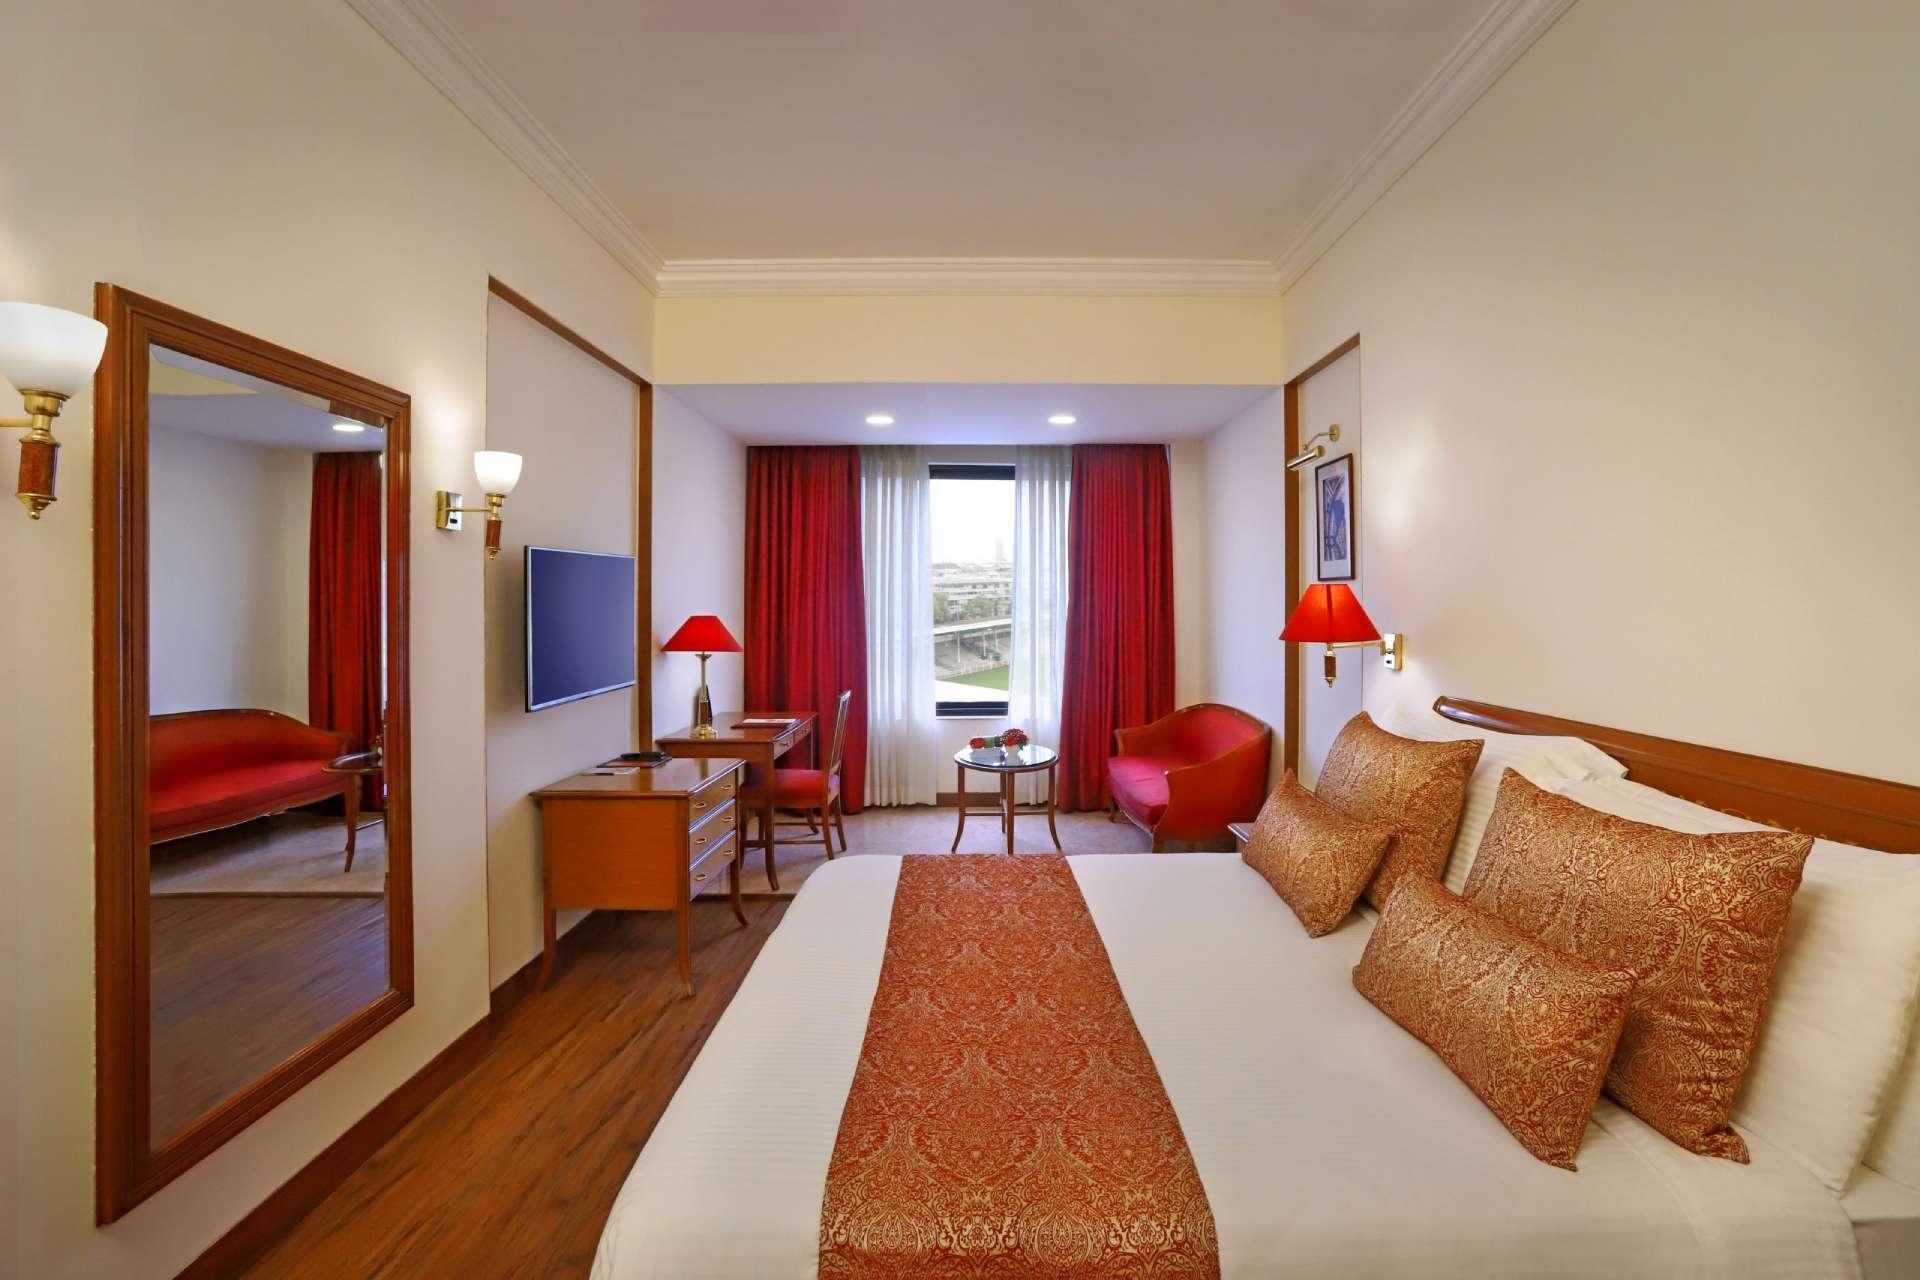 the ambassador executive room banner - The Ambassador | Heritage Hotels in Mumbai, Aurangabad, Chennai - Our Rooms